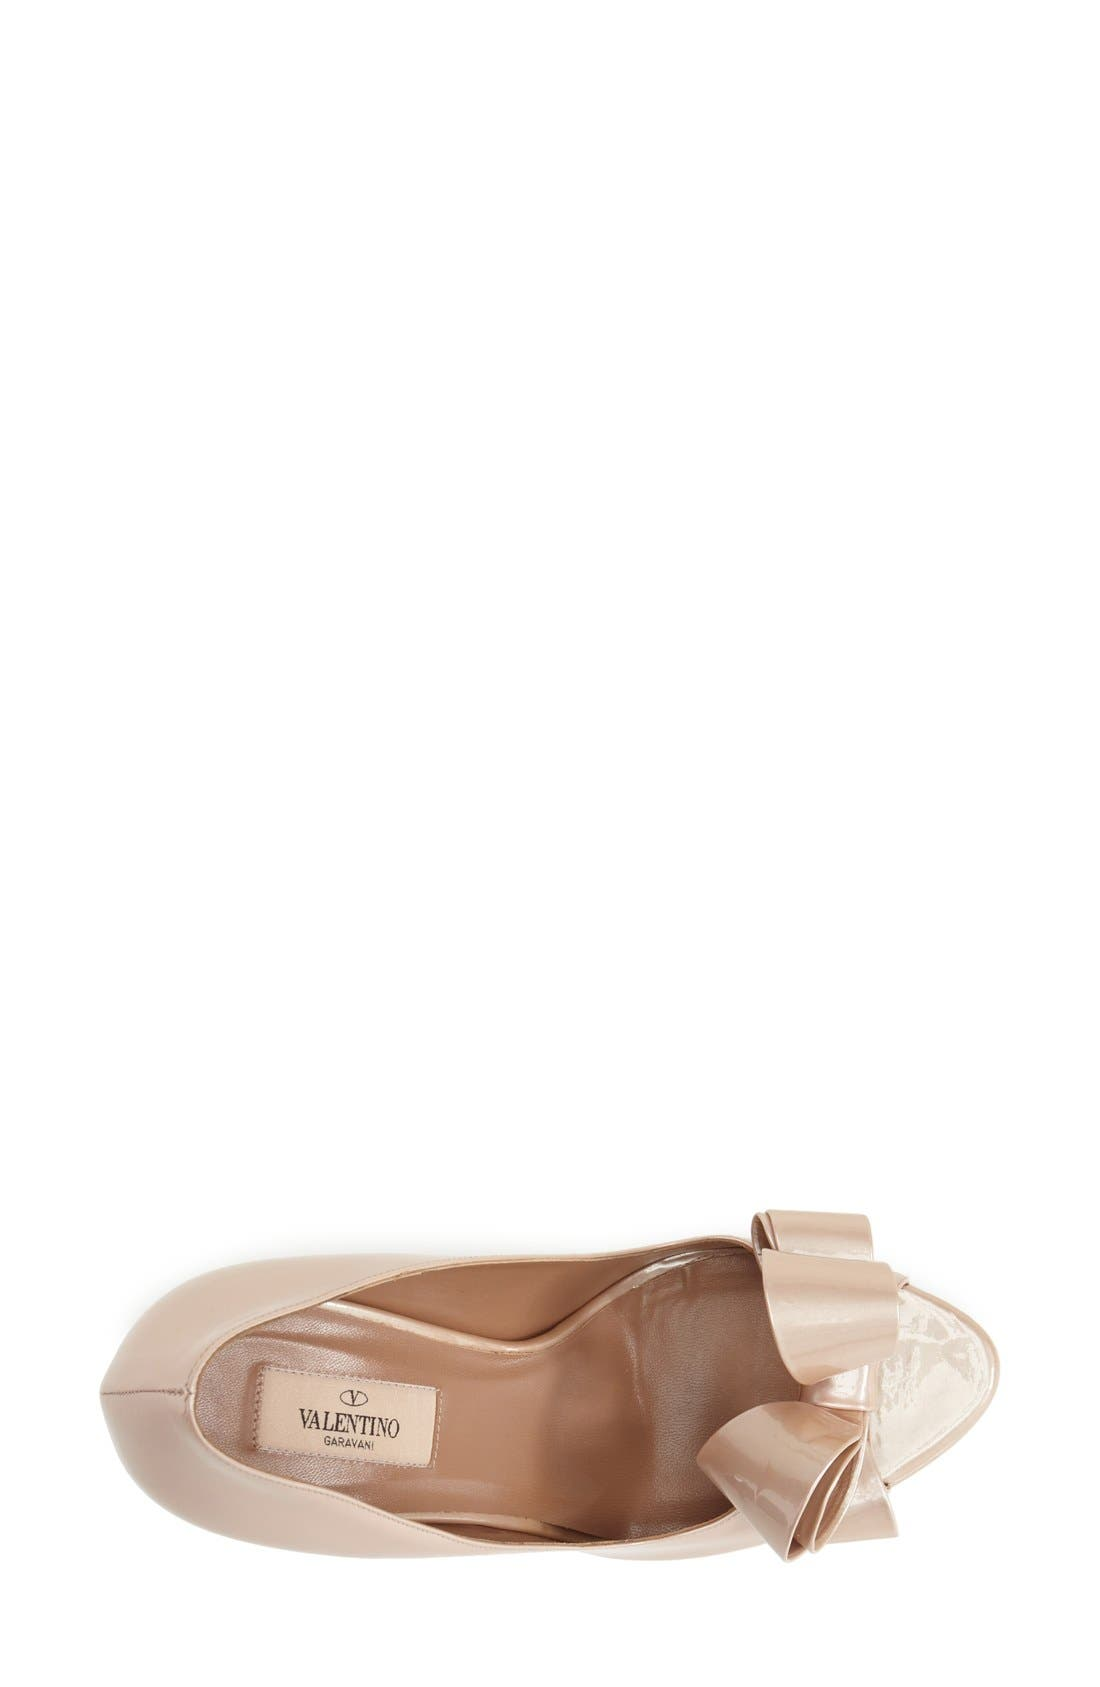 Alternate Image 3  - Valentino Couture Bow Platform Pump (Women)